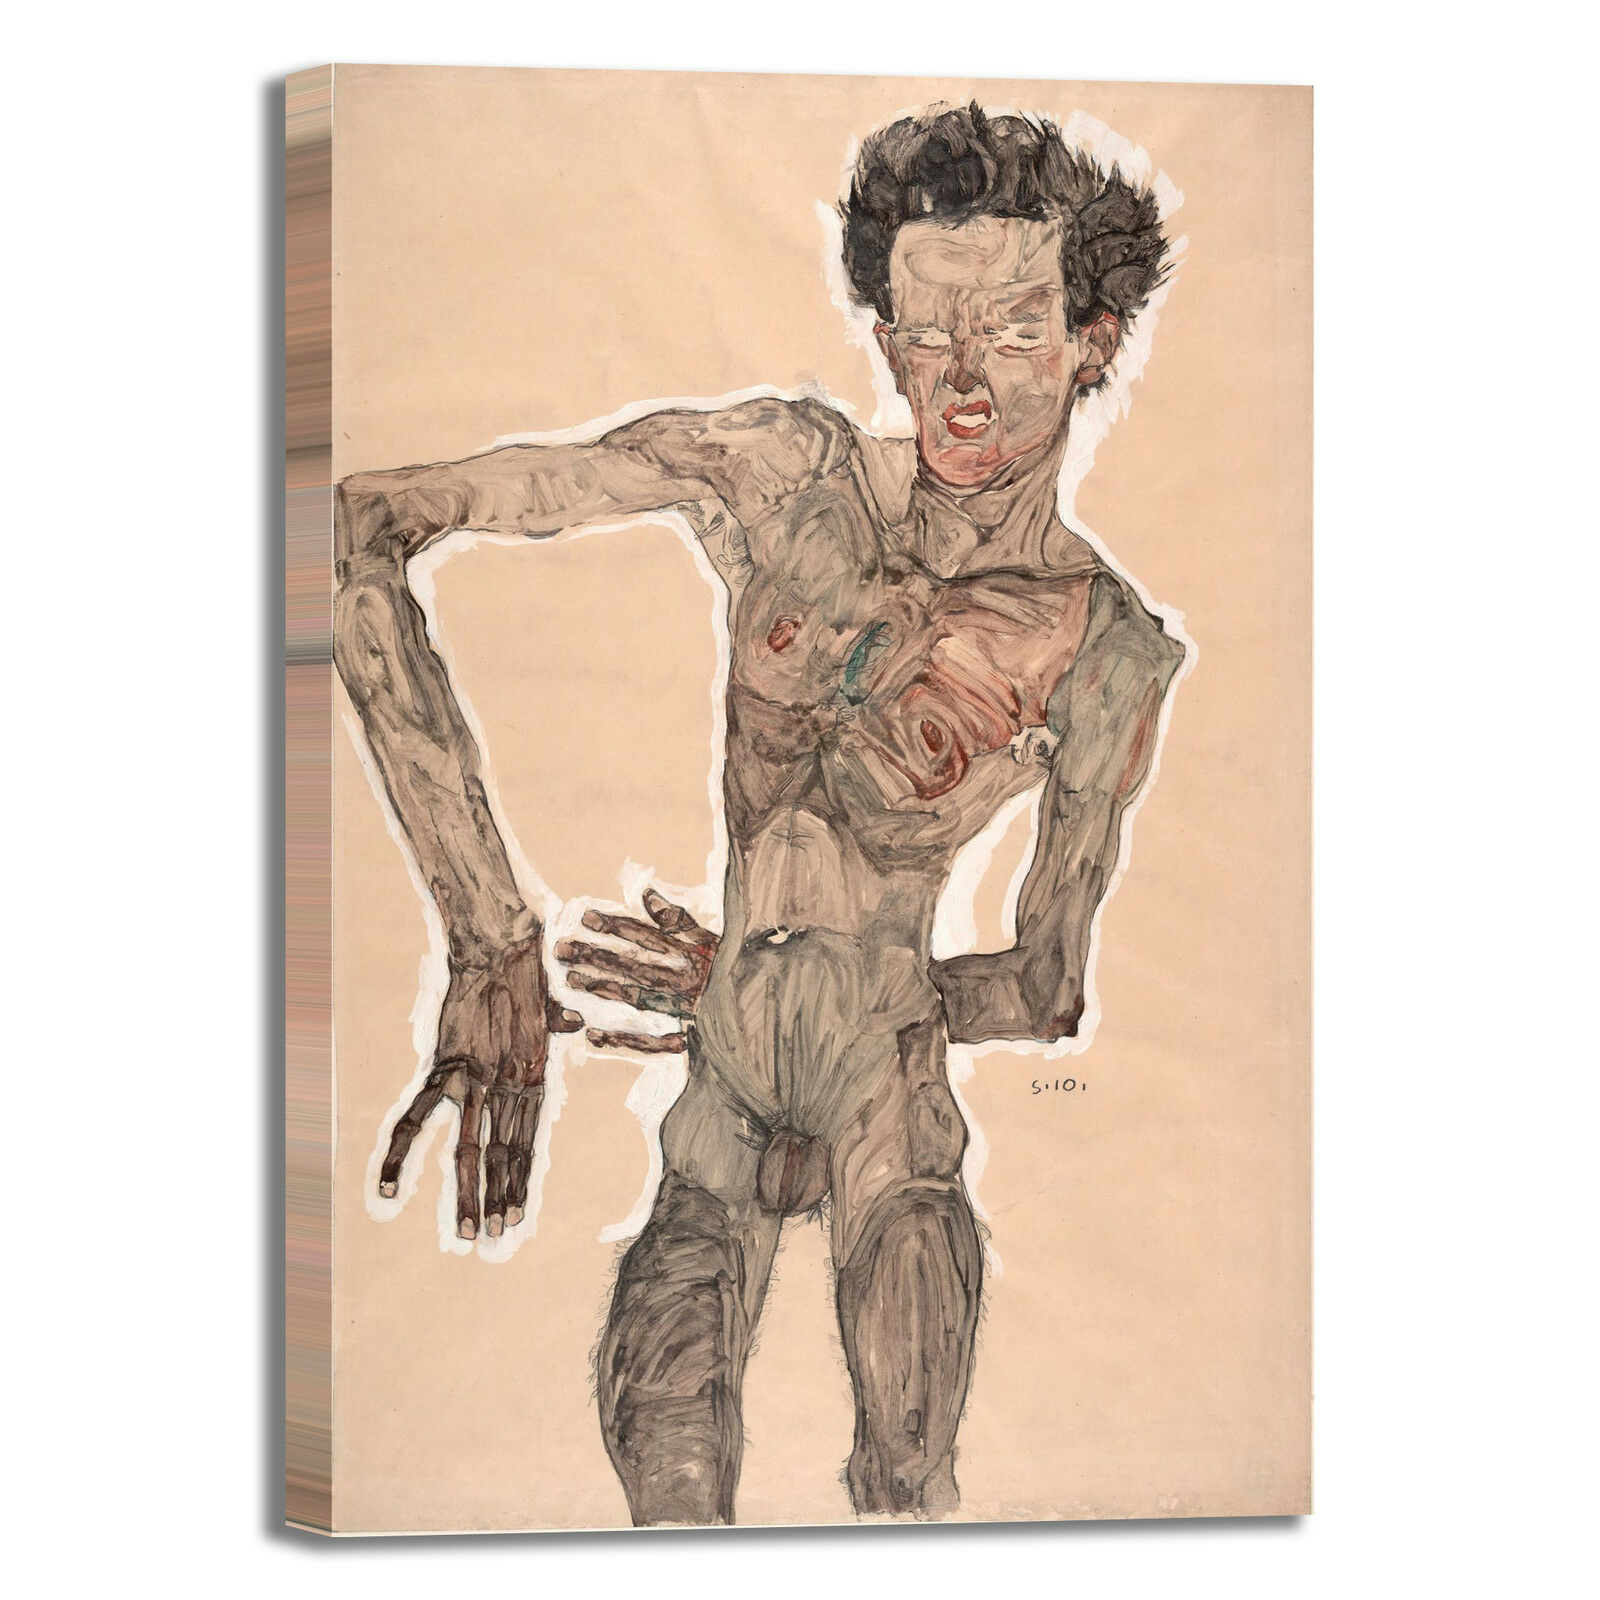 Schiele autoritratto nudo 2 design quadro stampa tela telaio dipinto telaio tela arRouge o casa 00867a